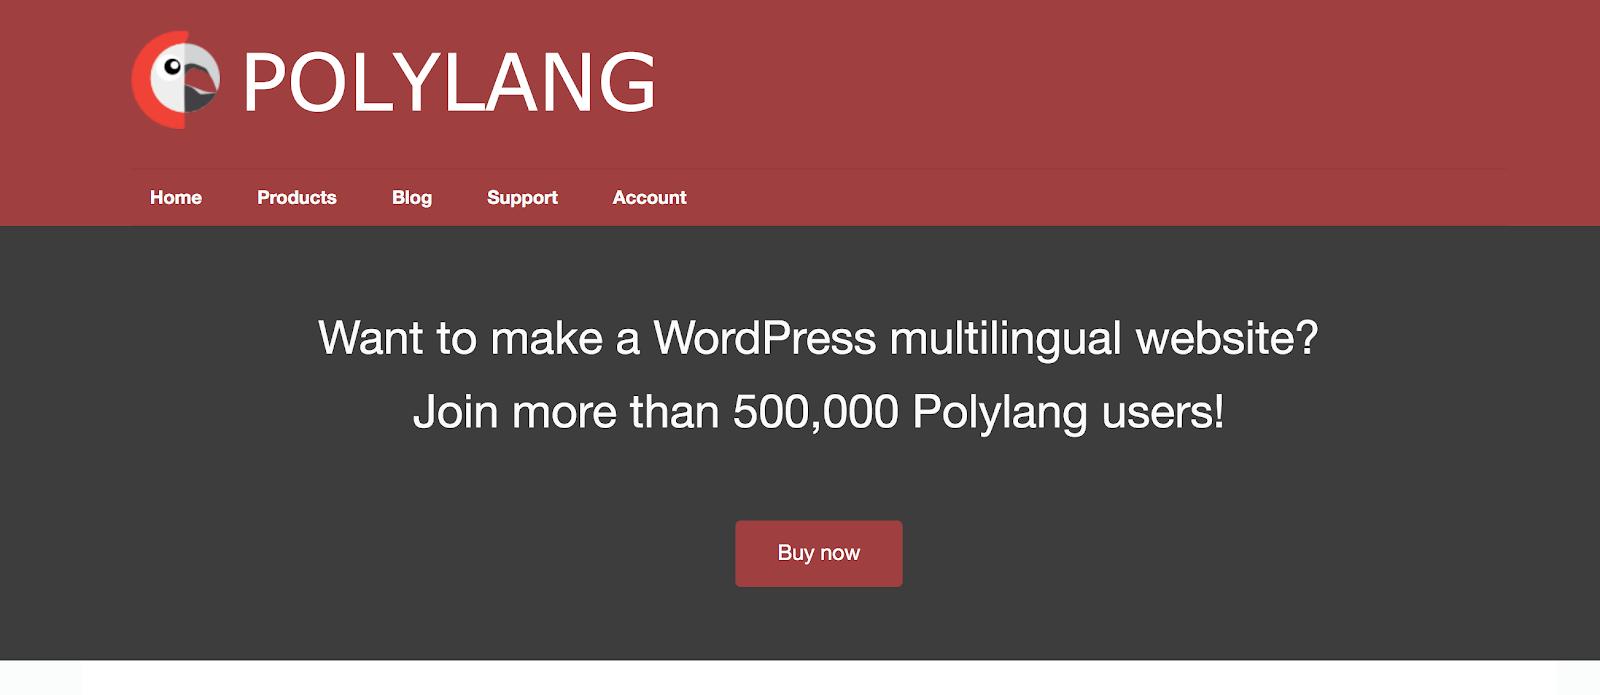 Screenshot of Polylang website